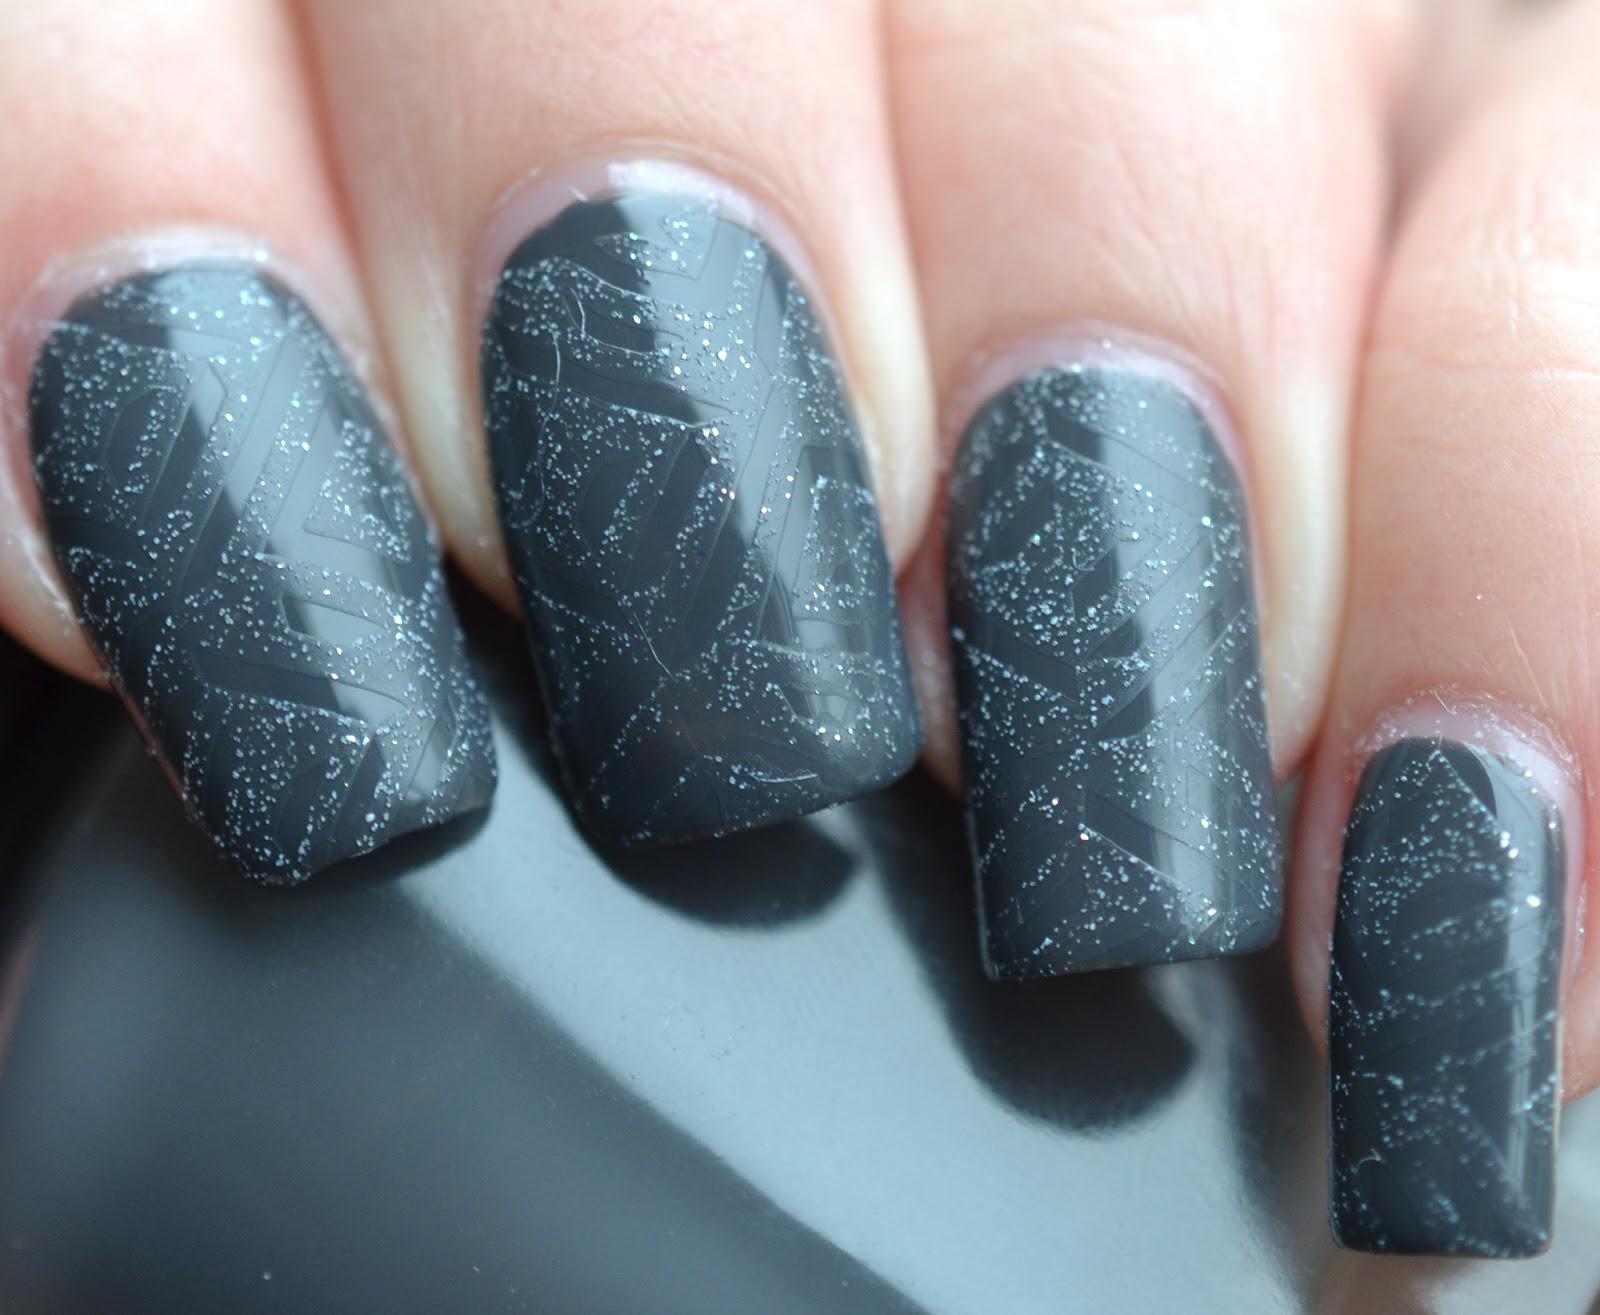 http://lenas-sofa.blogspot.de/2015/02/sally-hansen-complete-salon-manicure.html